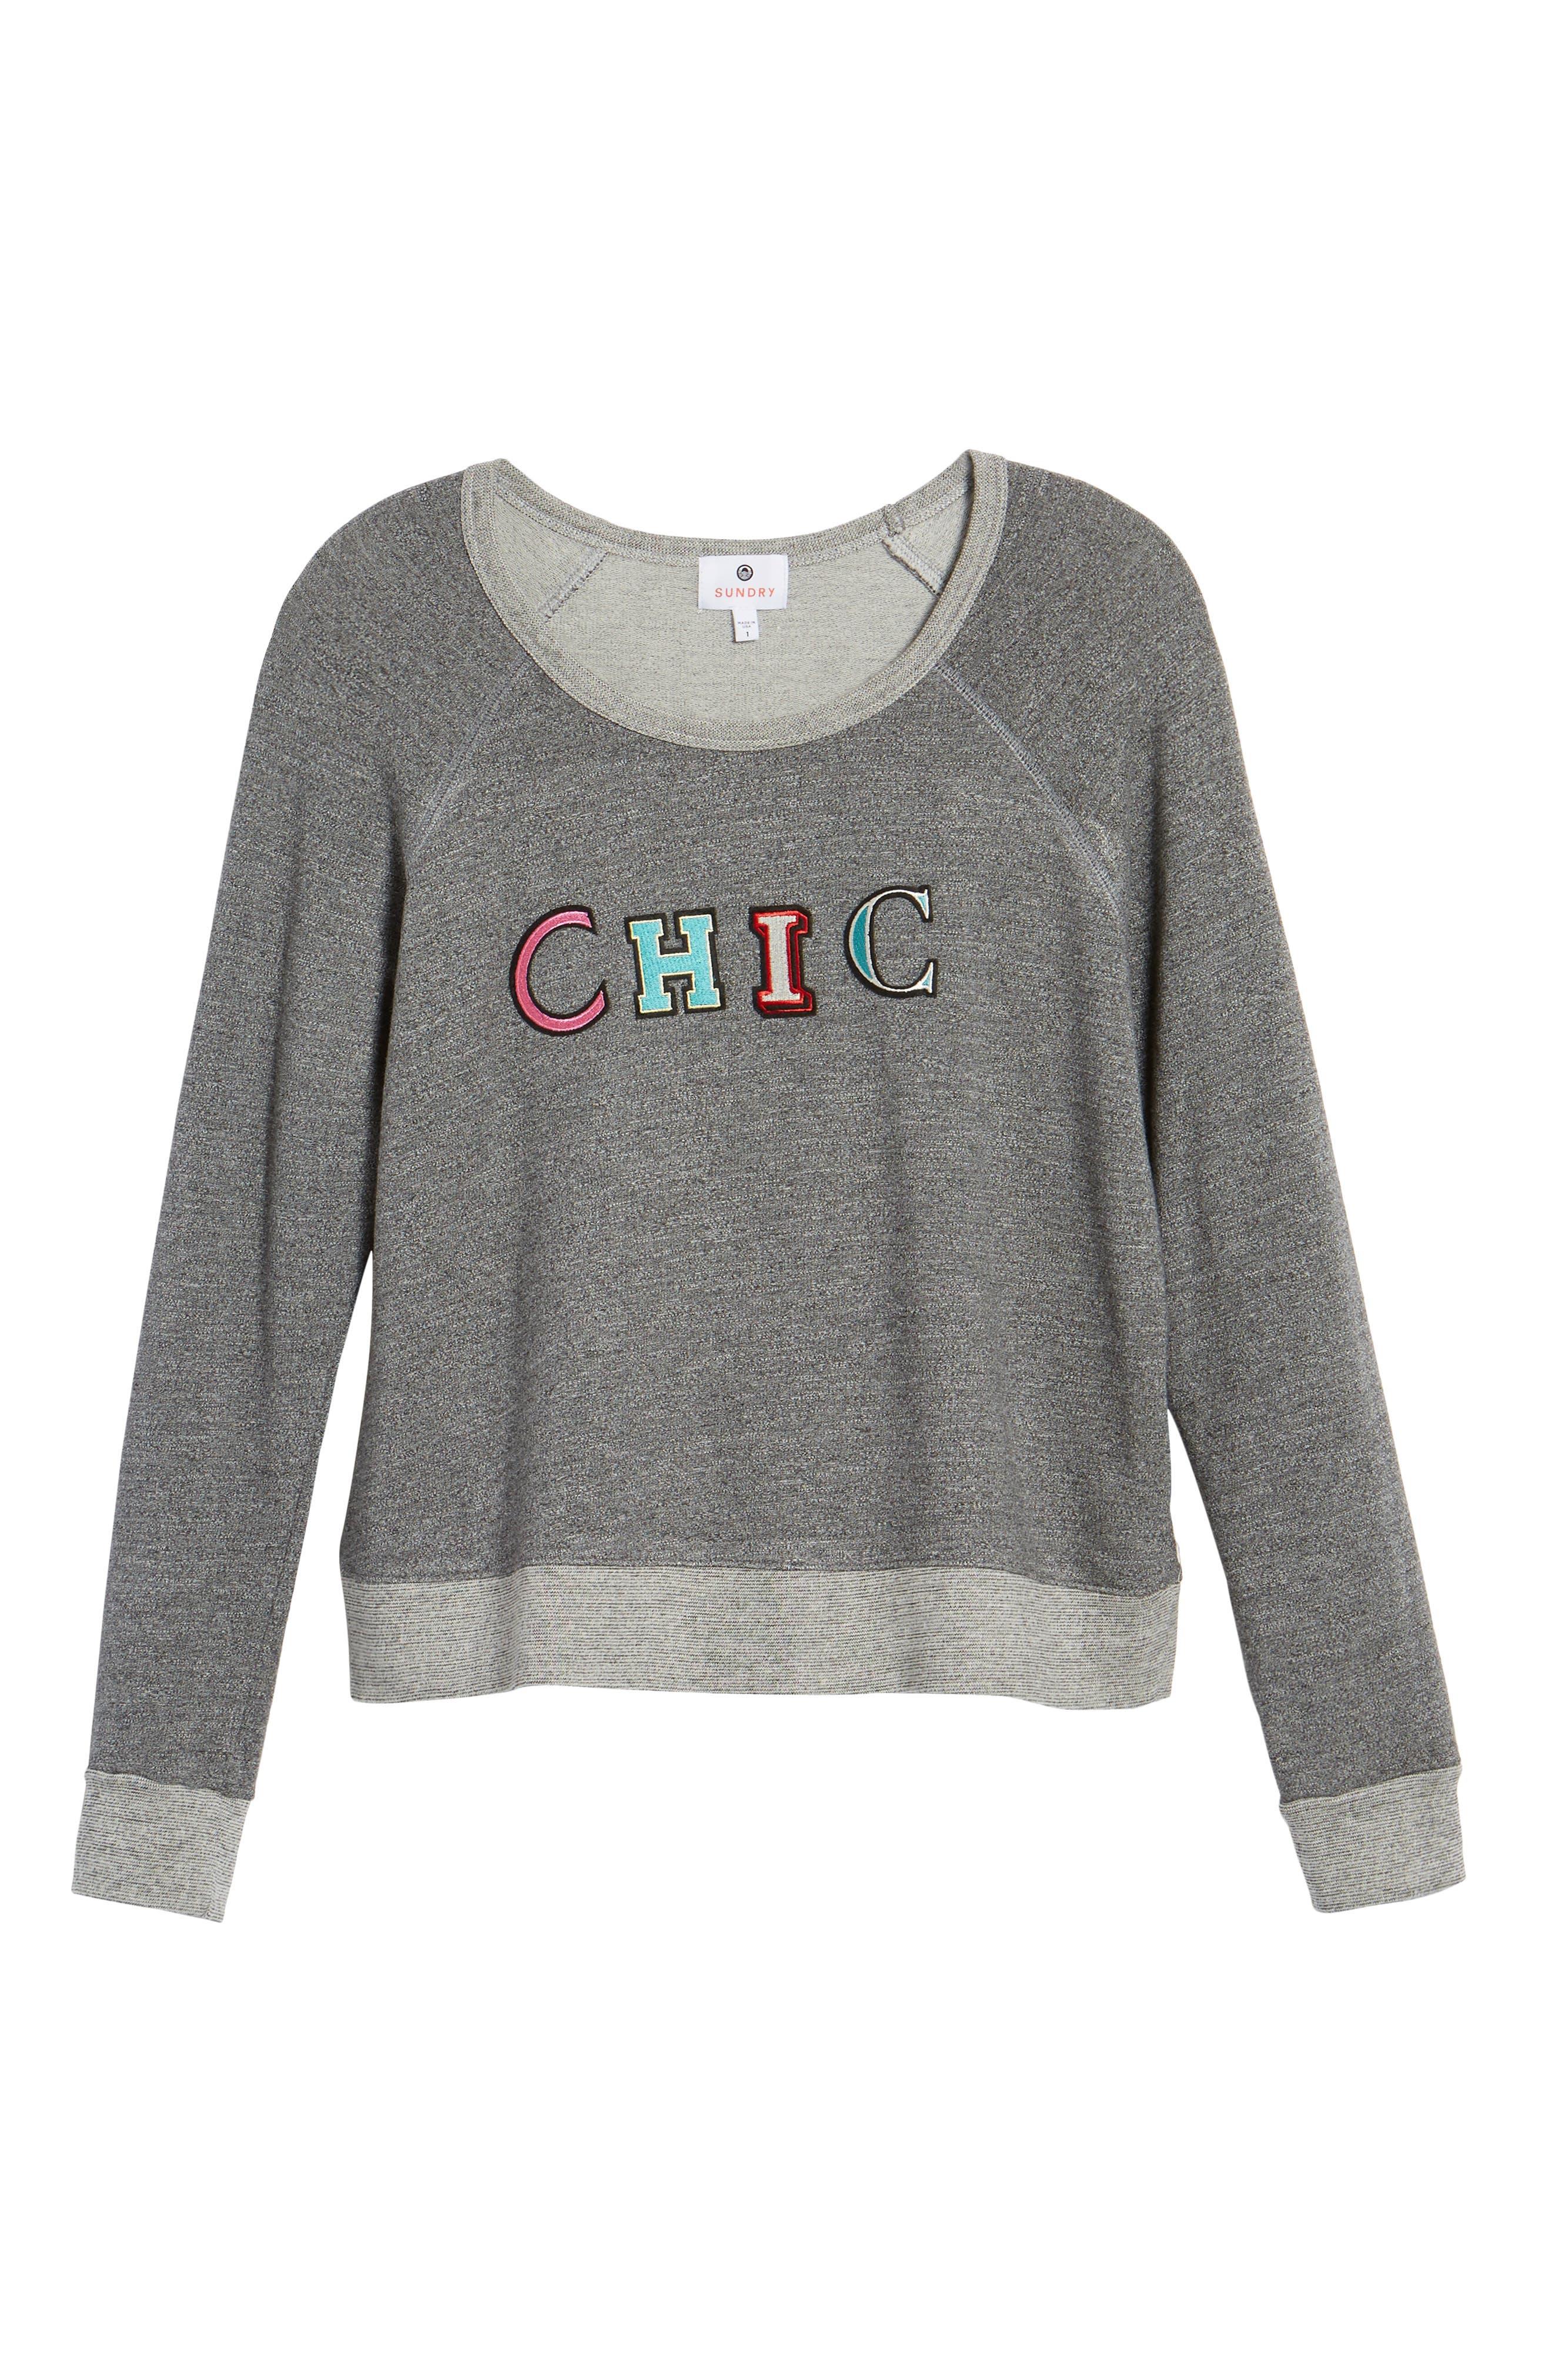 Chic Crop Sweatshirt,                             Alternate thumbnail 6, color,                             039